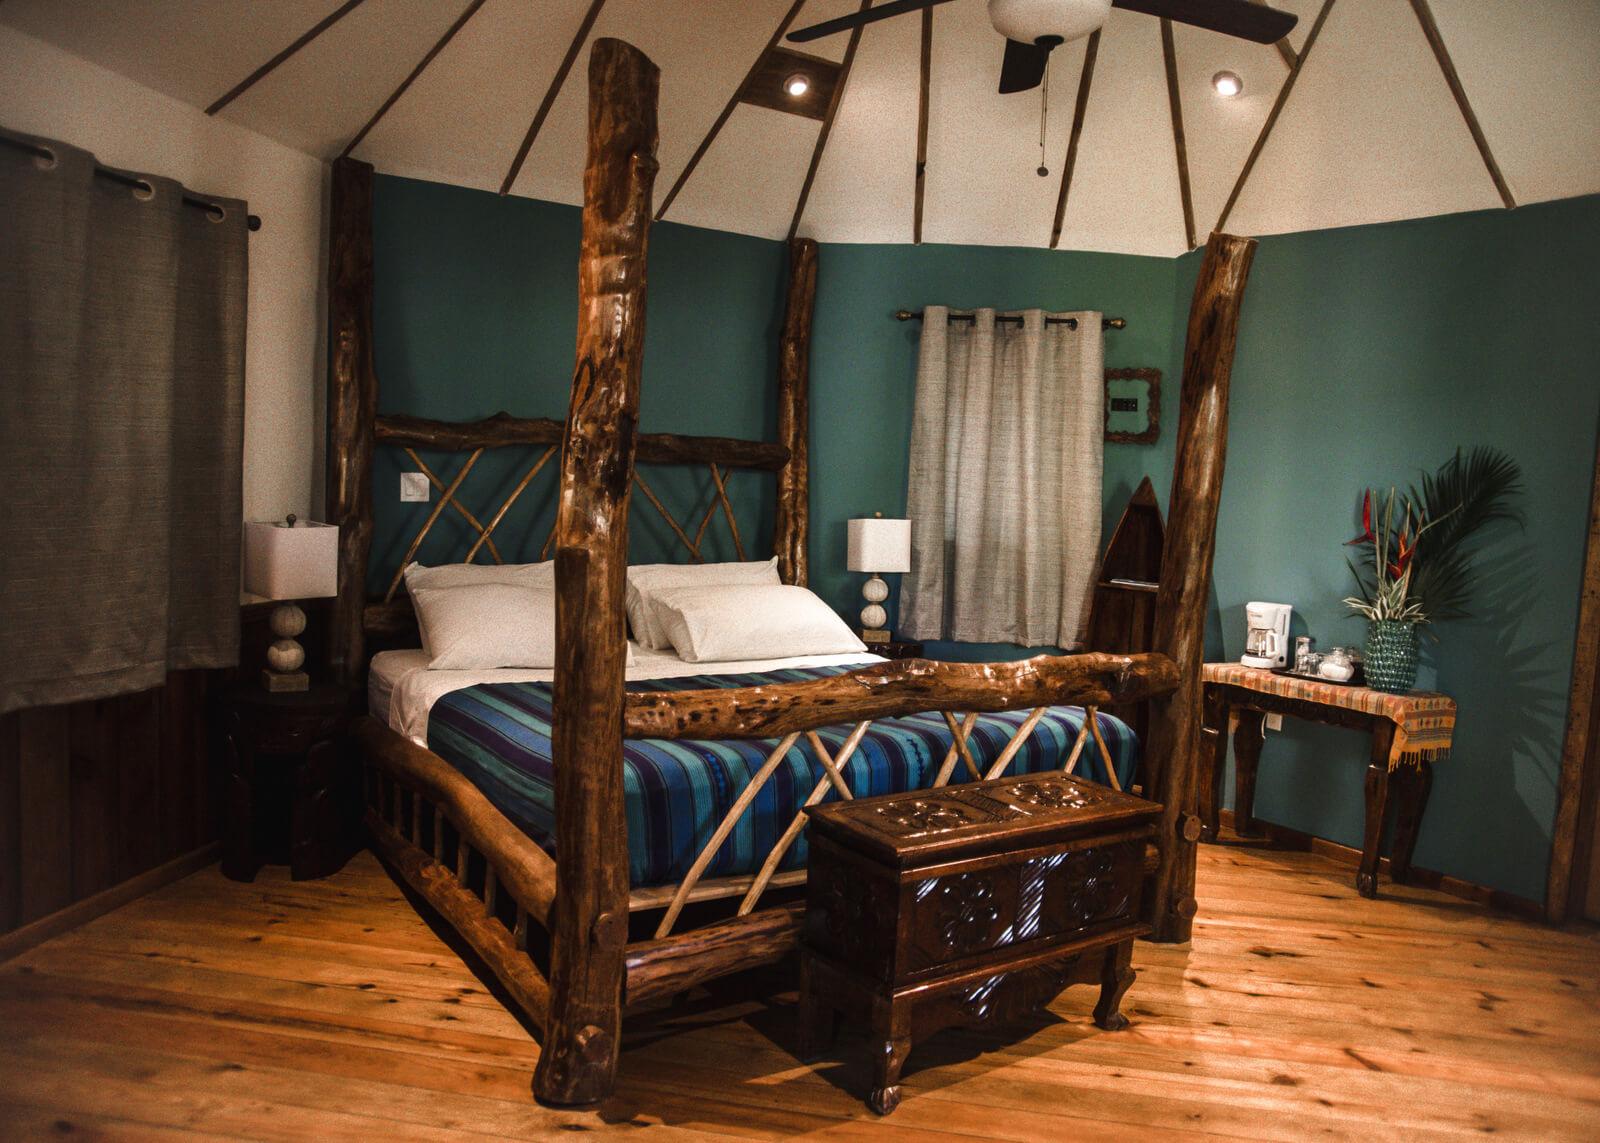 eagle-ray-bedroom